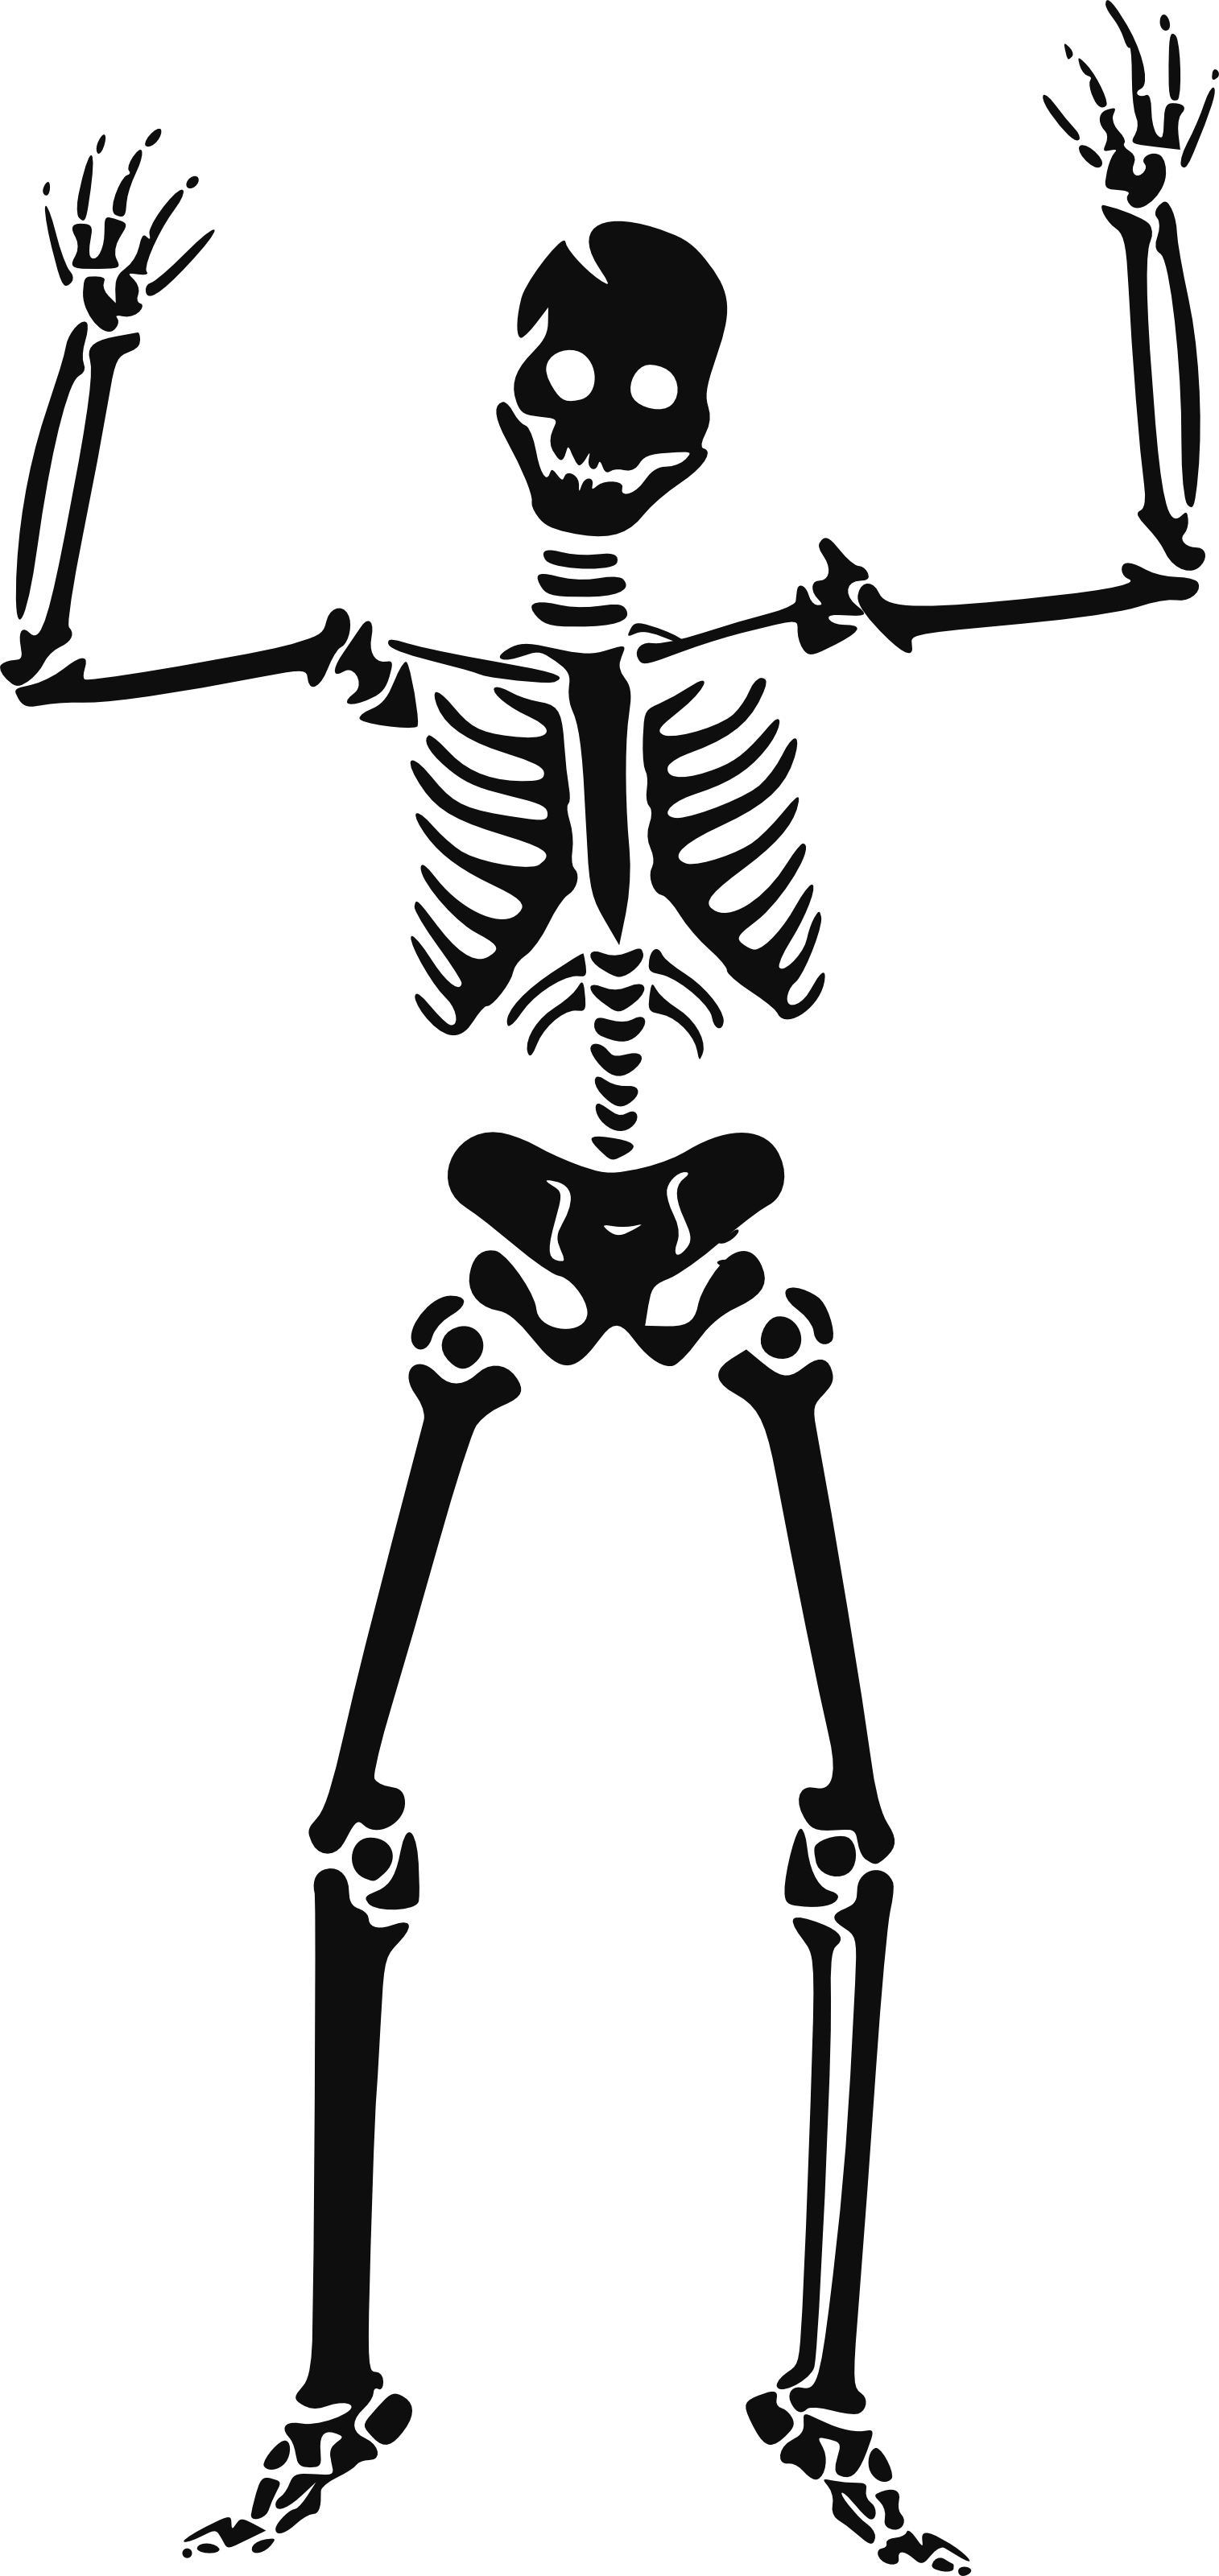 Dog skeleton clipart download Bone skeleton clipart, explore pictures download